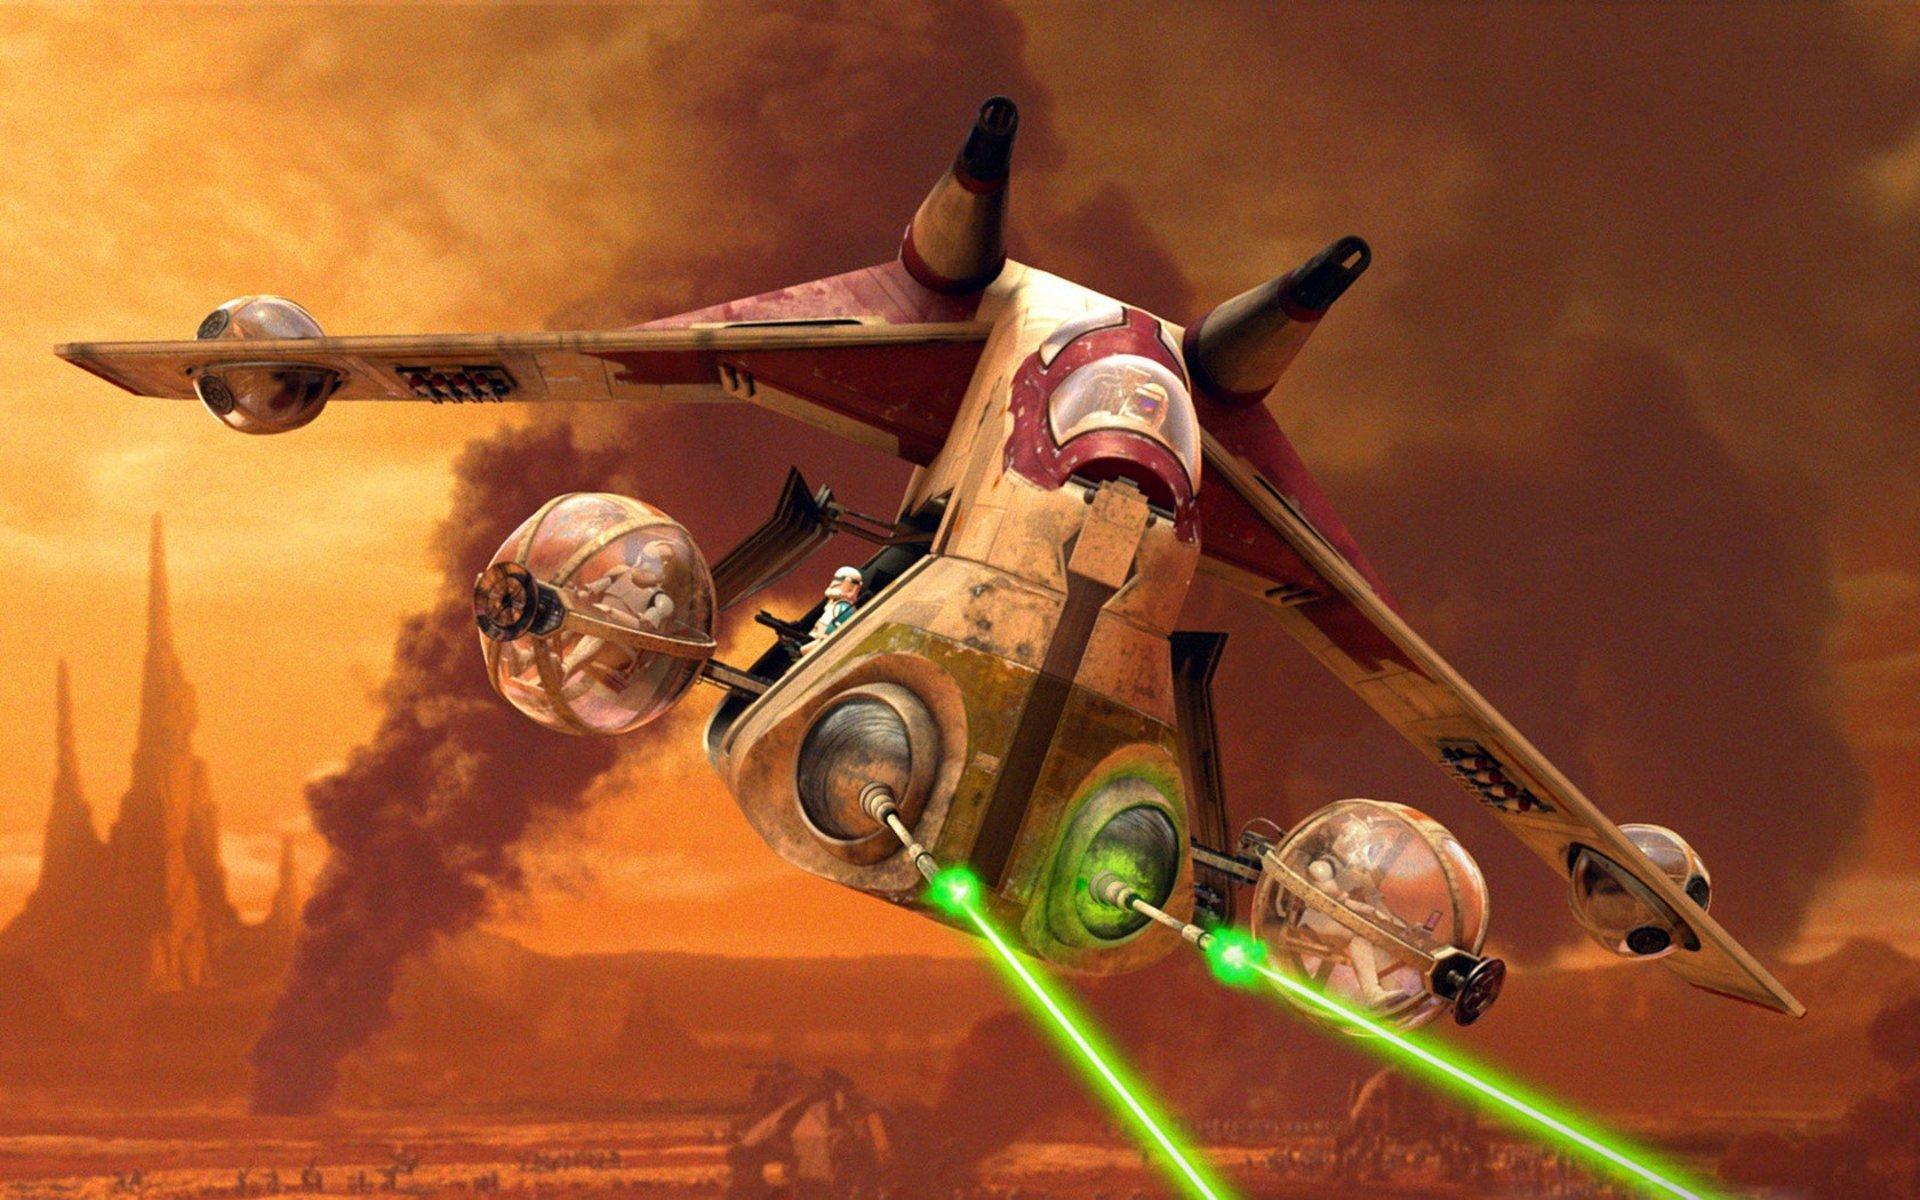 Www Animation Wallpaper Com Star Wars Clone Wars Animation Sci Fi Cartoon Futuristic